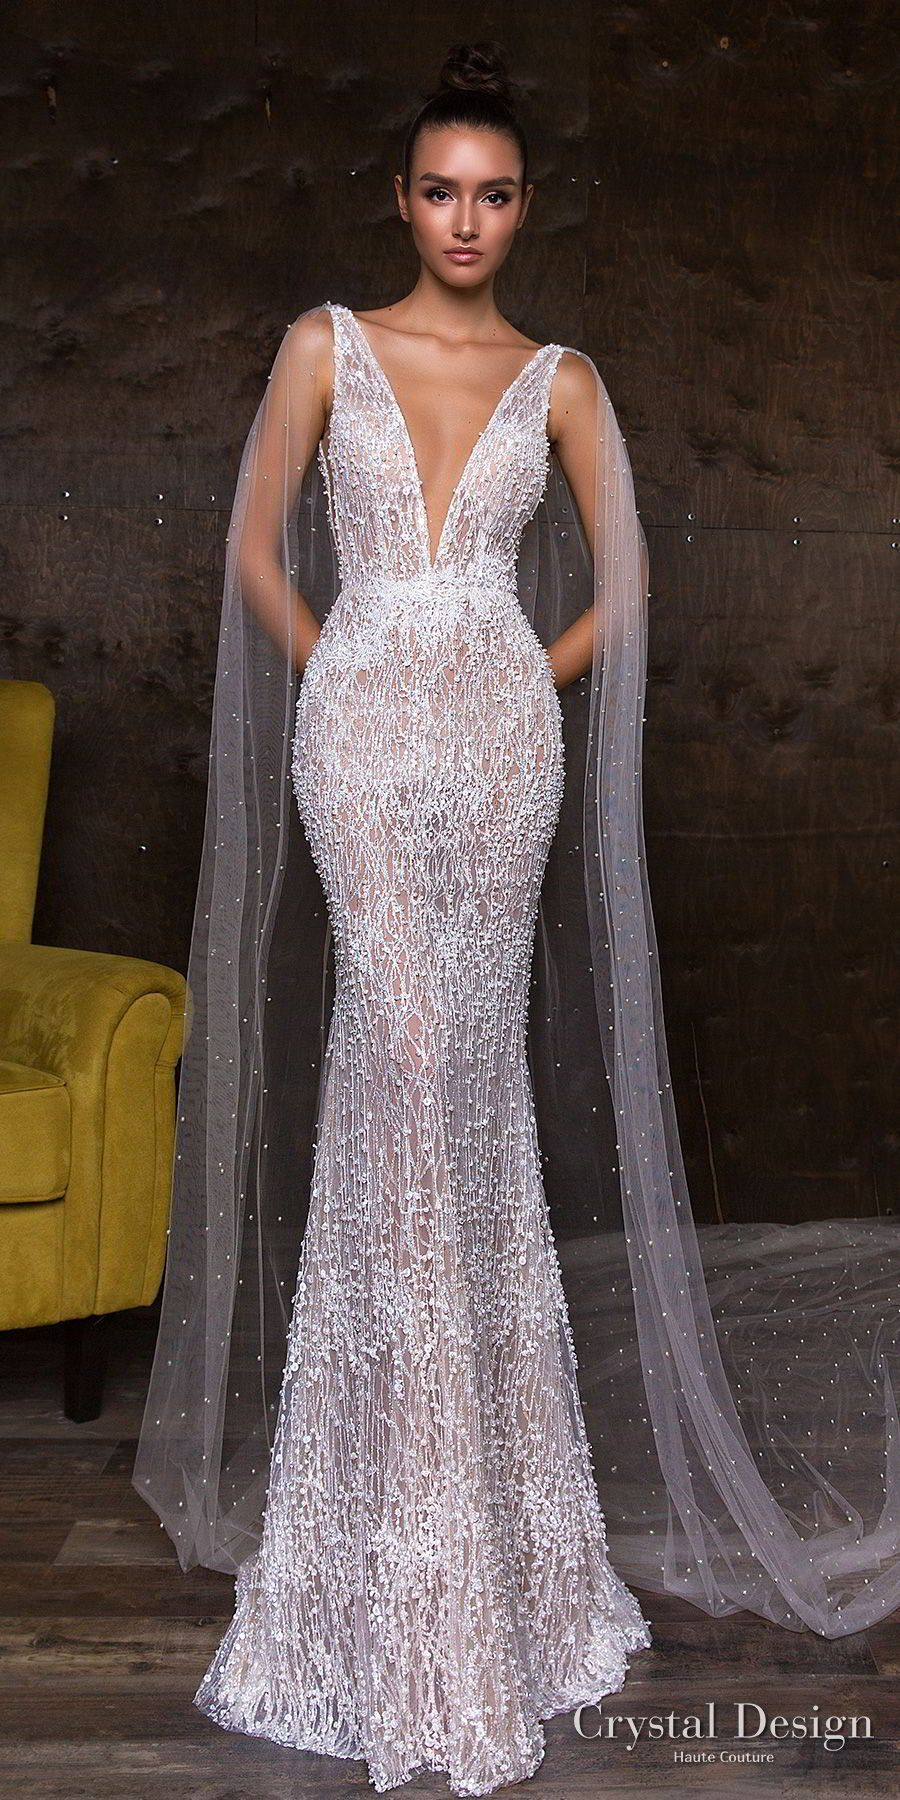 Crystal Design 2018 Sleeveless Deep V Neck Full Embellishment Elegant Glamorous Sheath Wedding Dress Sheer Back Watteau Train Leni Mv